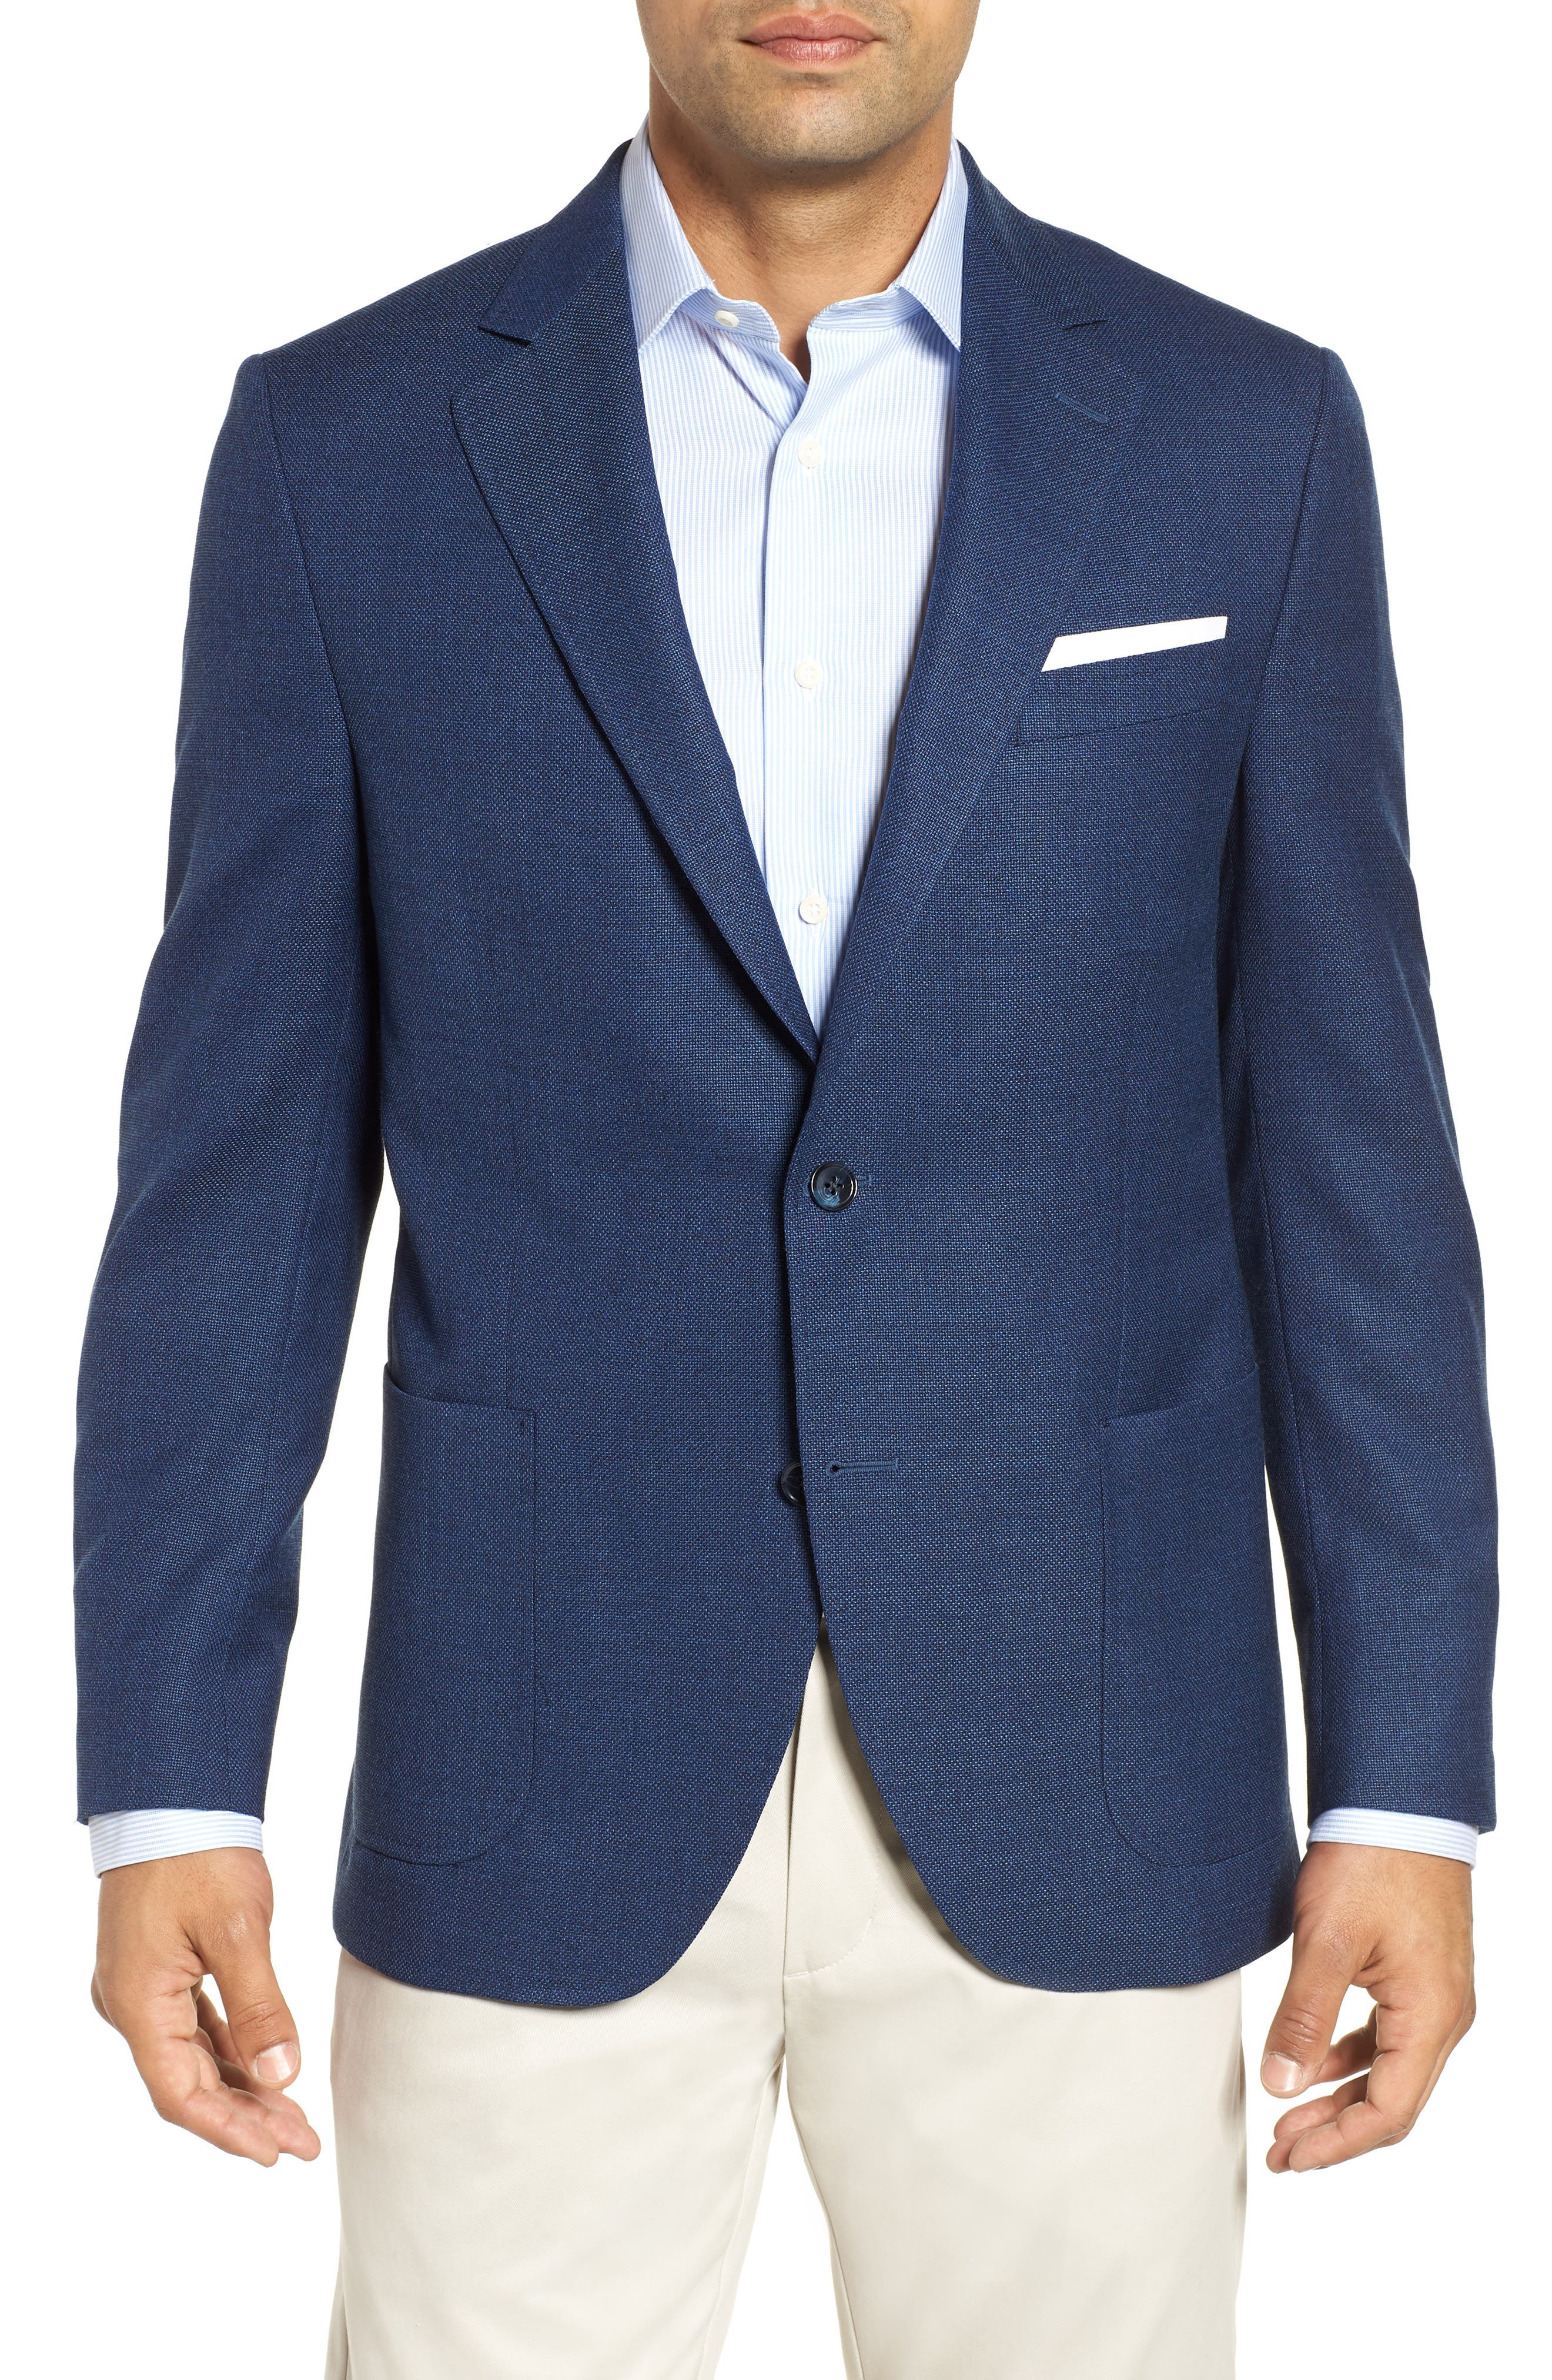 PETER MILLAR, Hyperlight Classic Fit Wool Sport Coat, Main thumbnail 1, color, 400